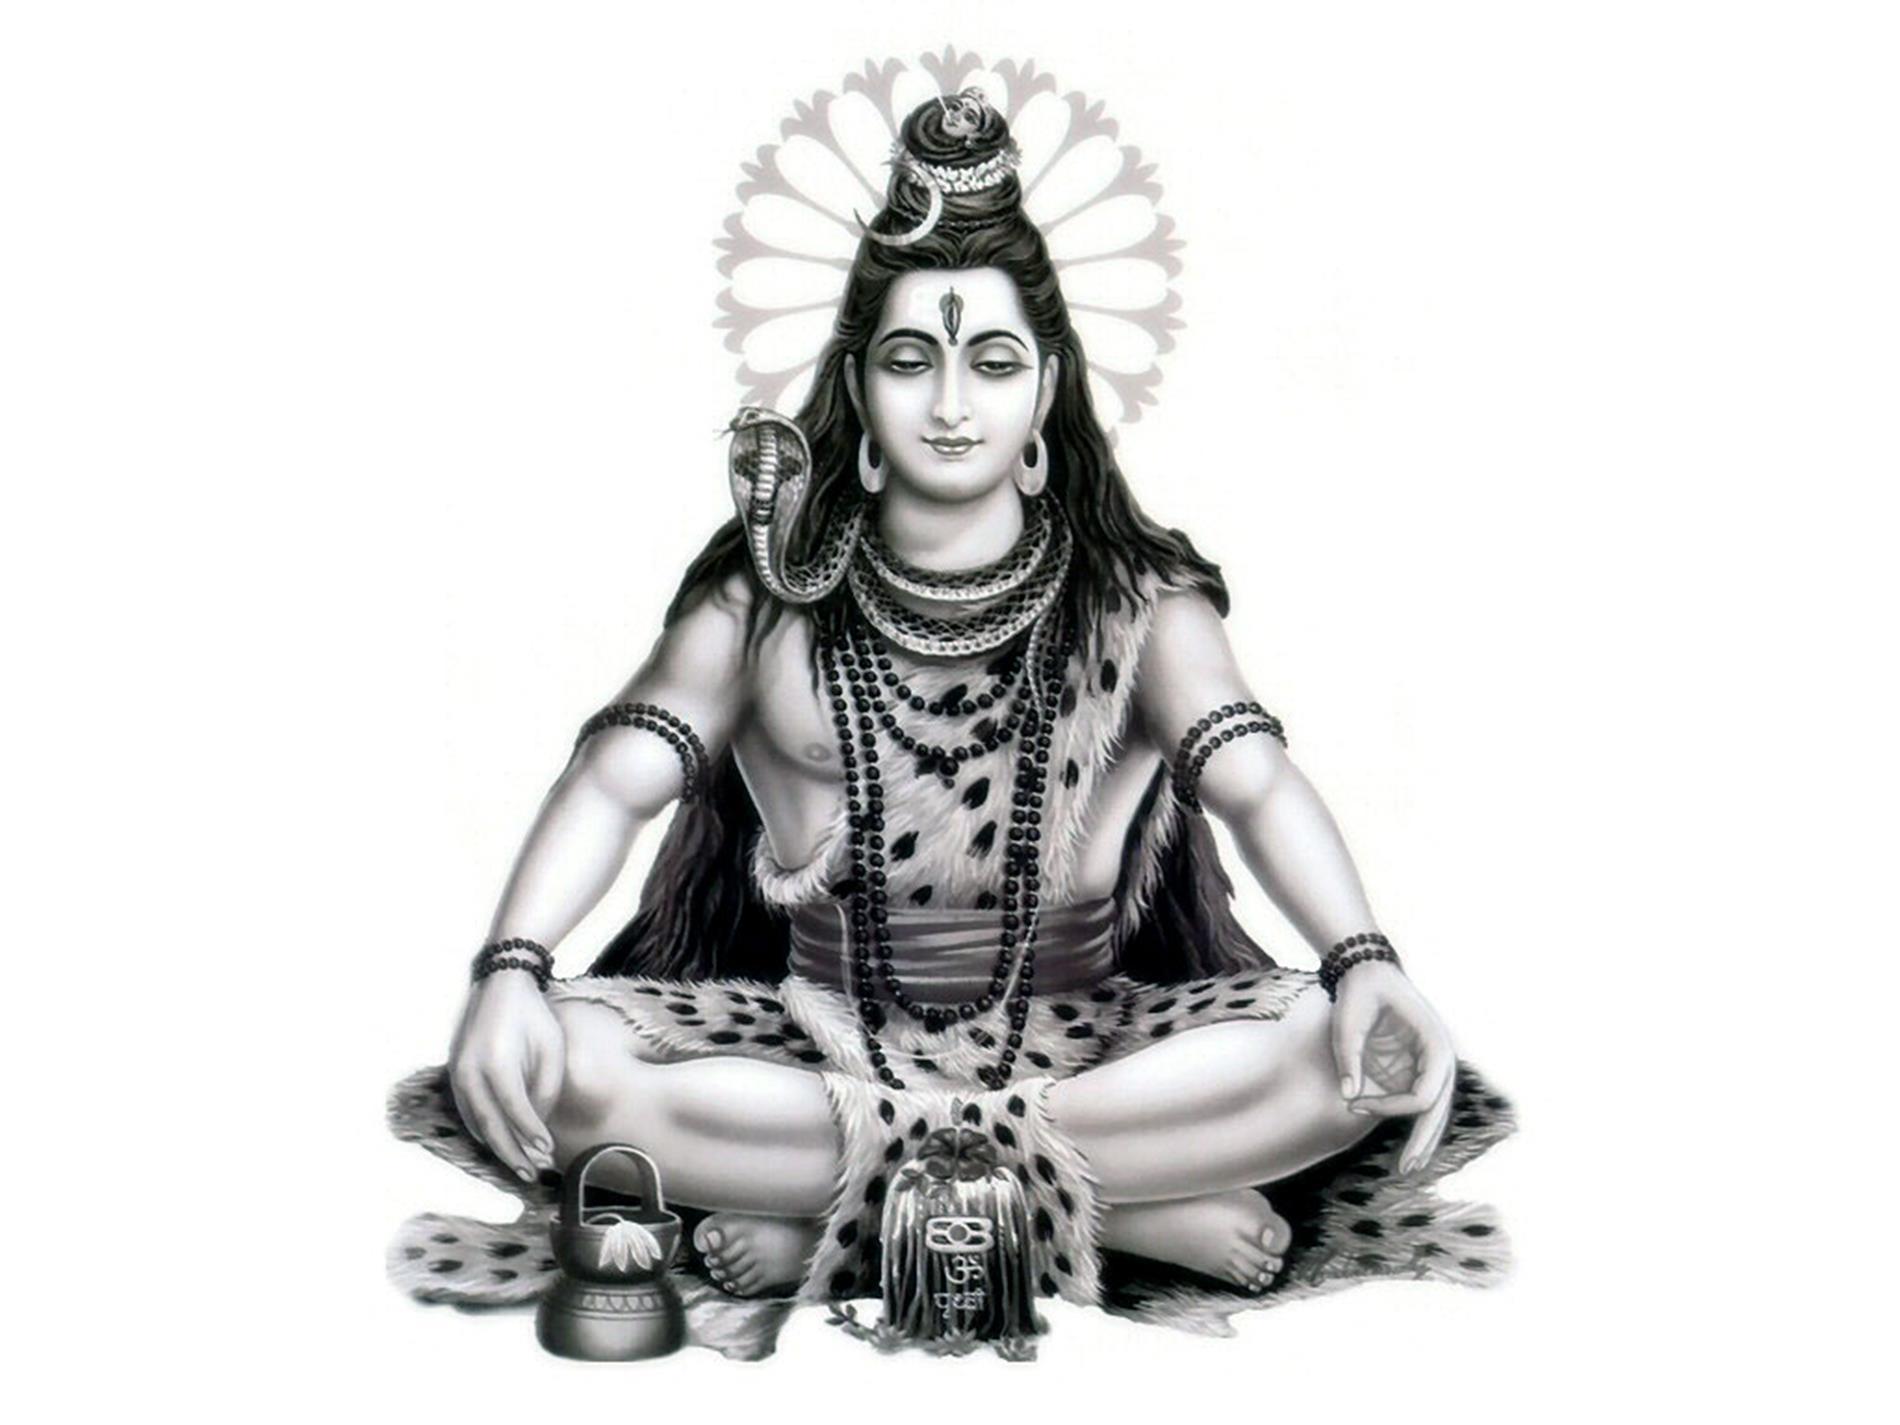 Lord Shiva Hd Wallpapers Wordzz